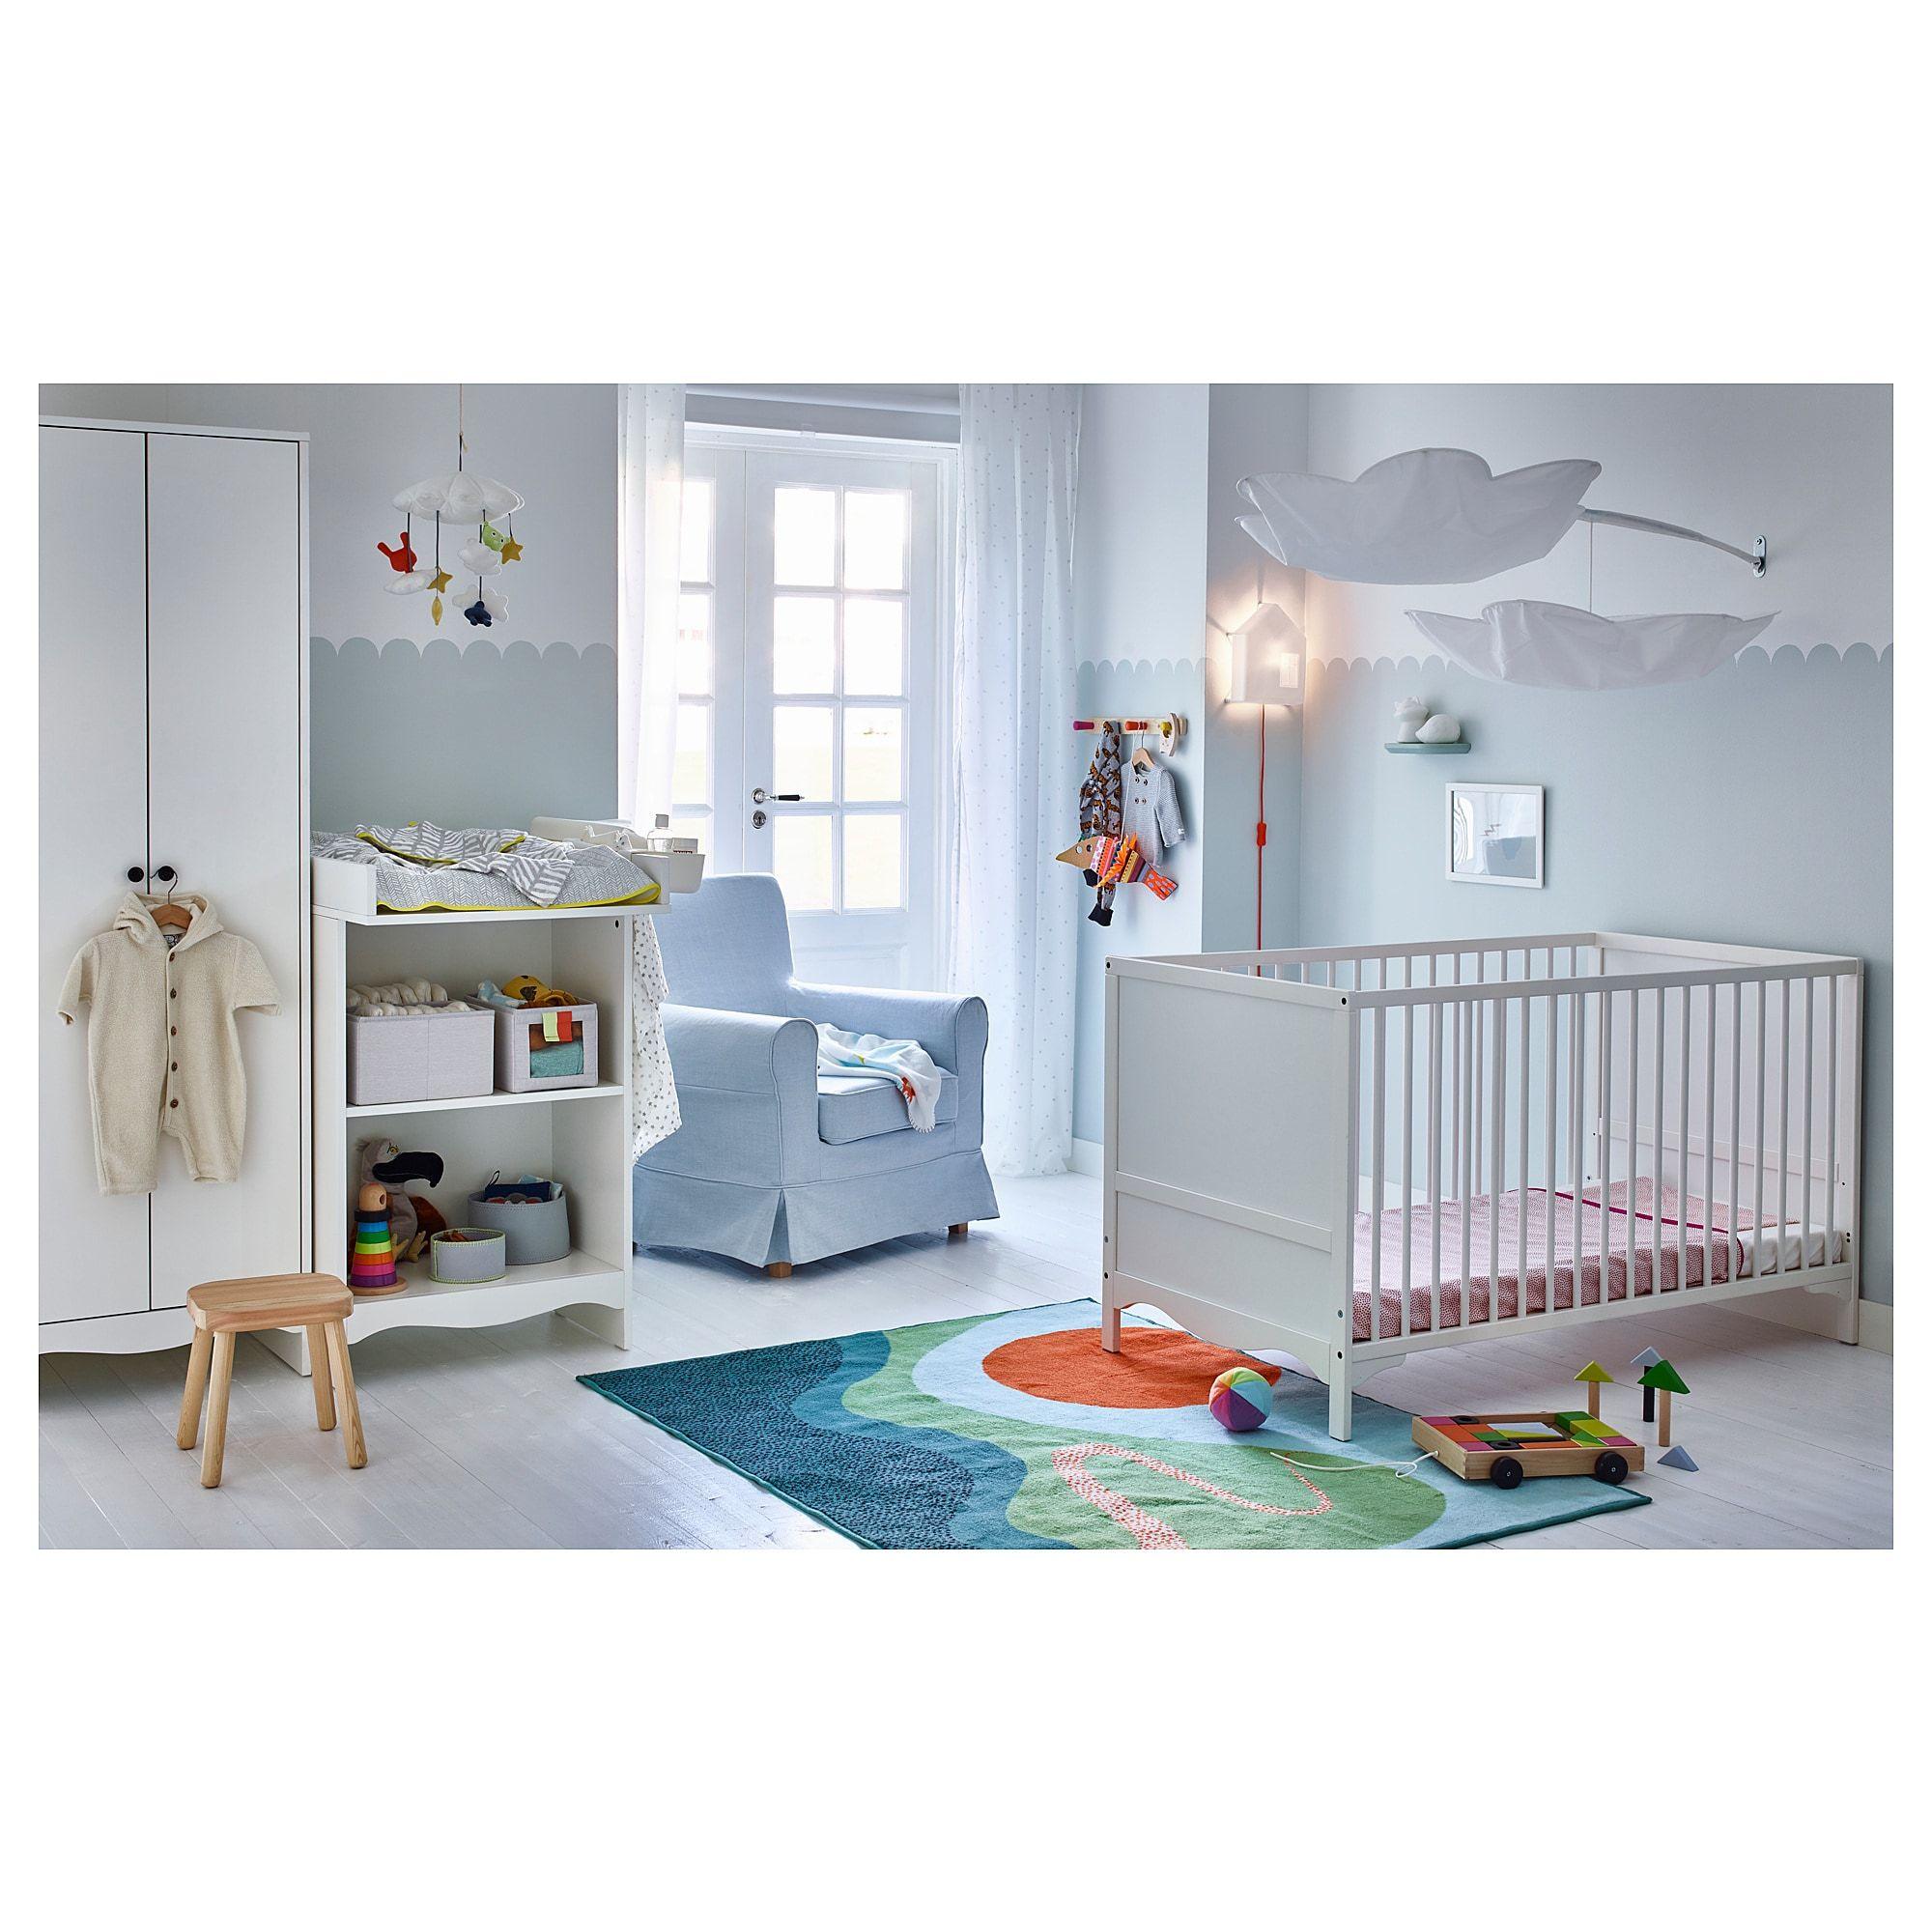 ikea solgul crib white in 2019 products baby furniture ikea rh pinterest com